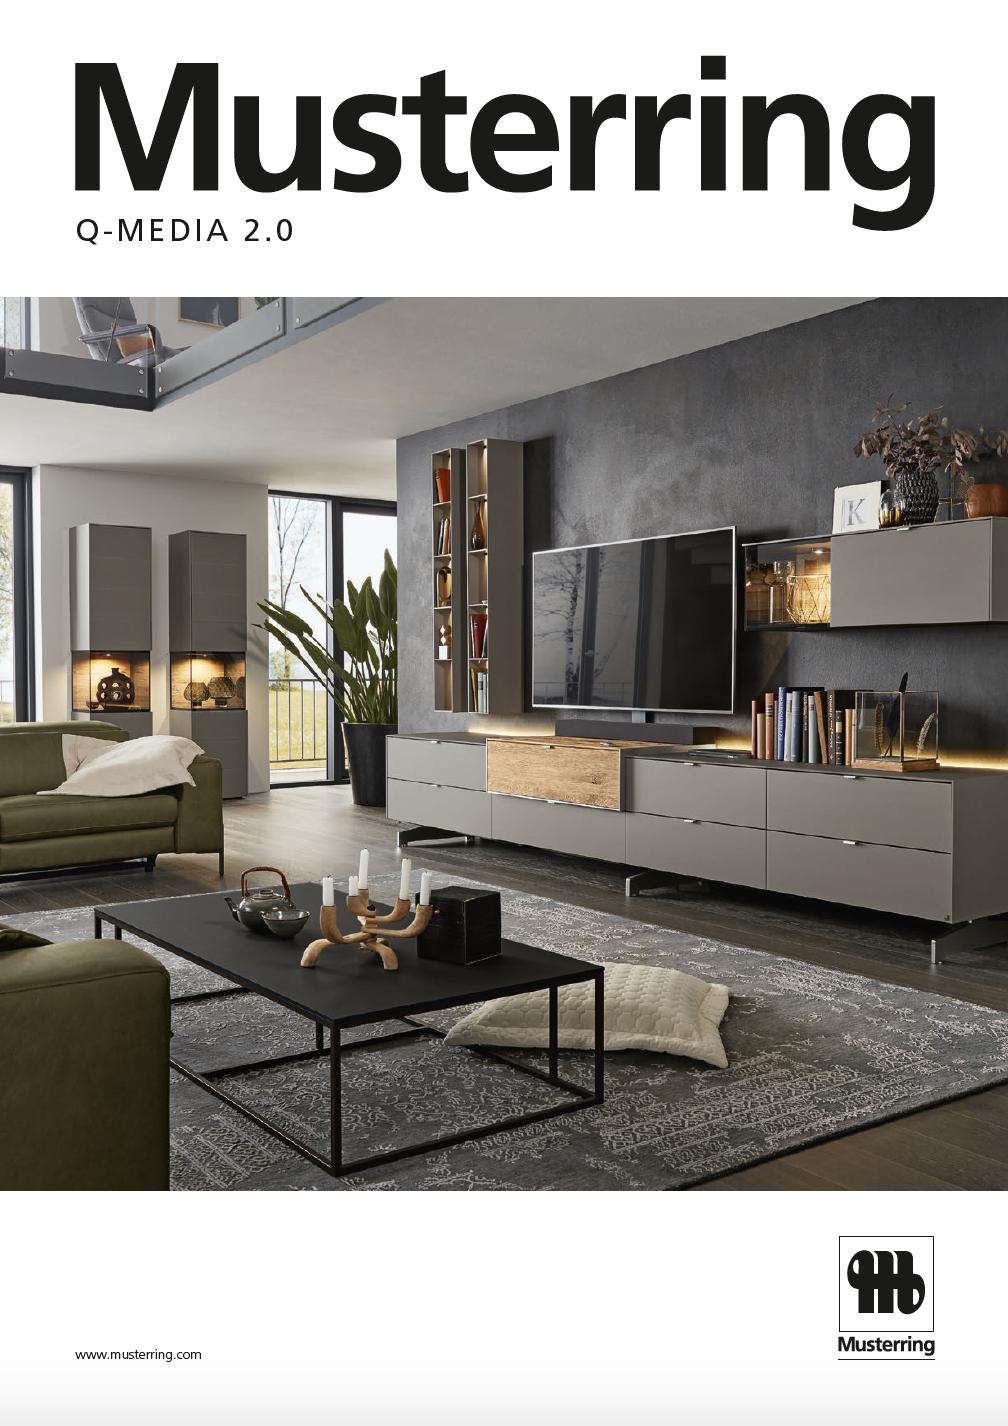 Musterring Katalog - Serie Q-Media